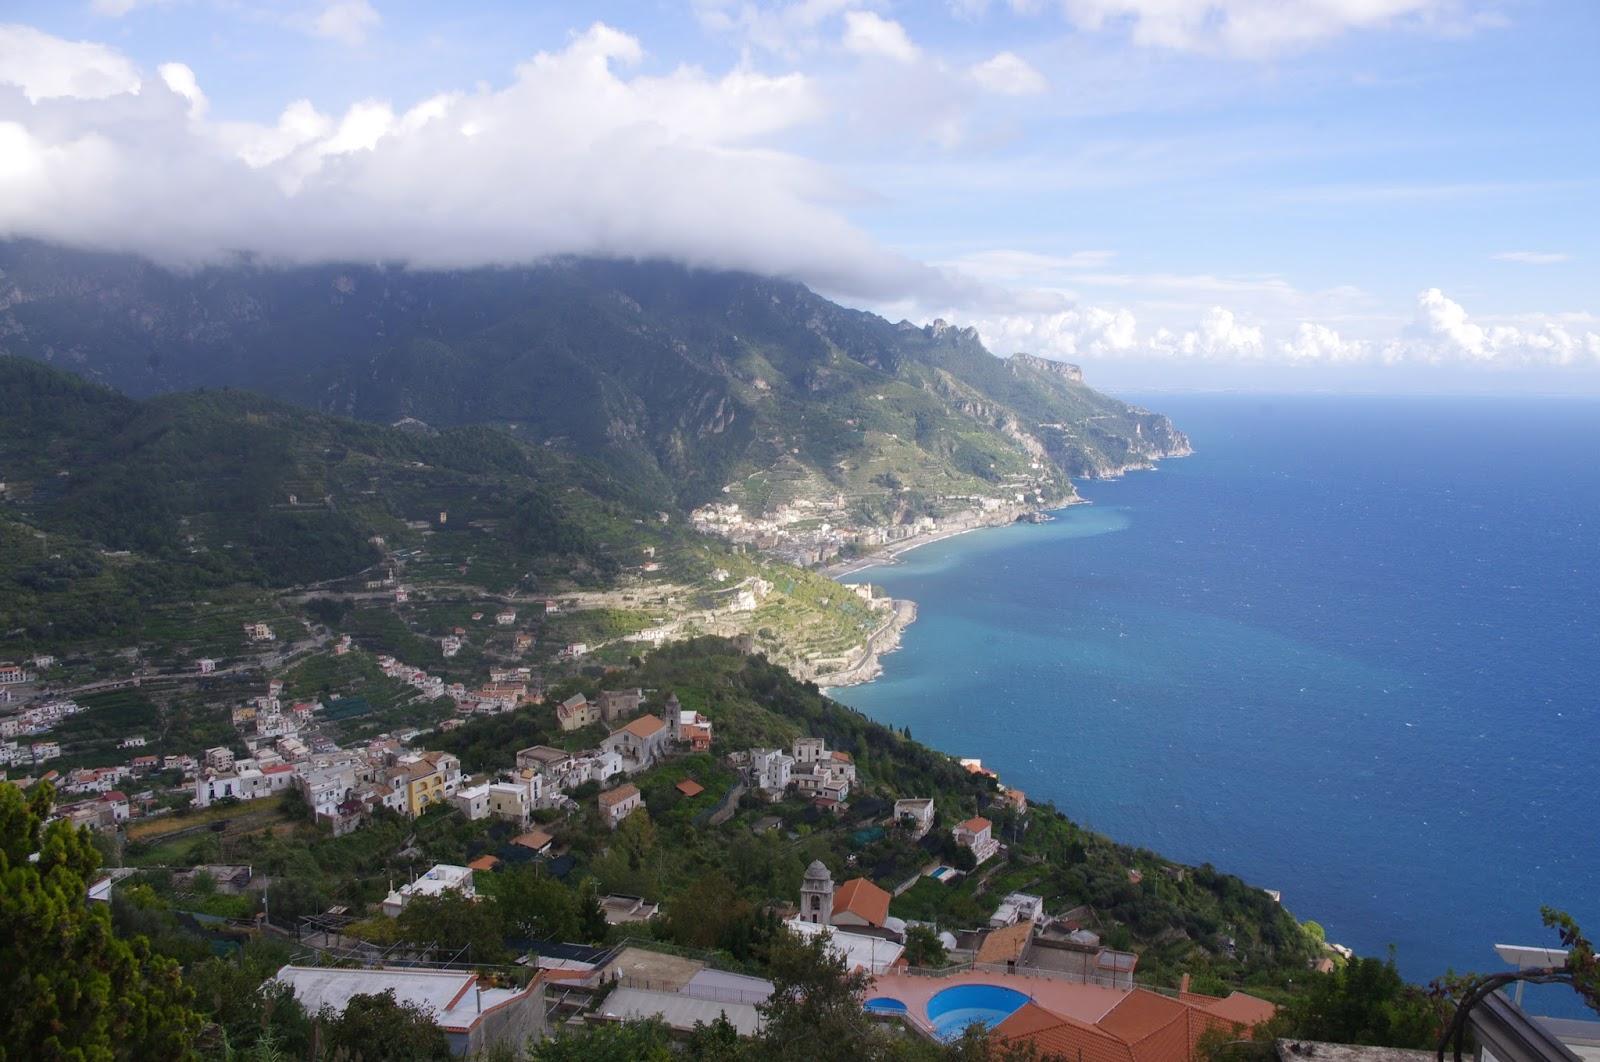 View of Amalfi Coast from Ravello